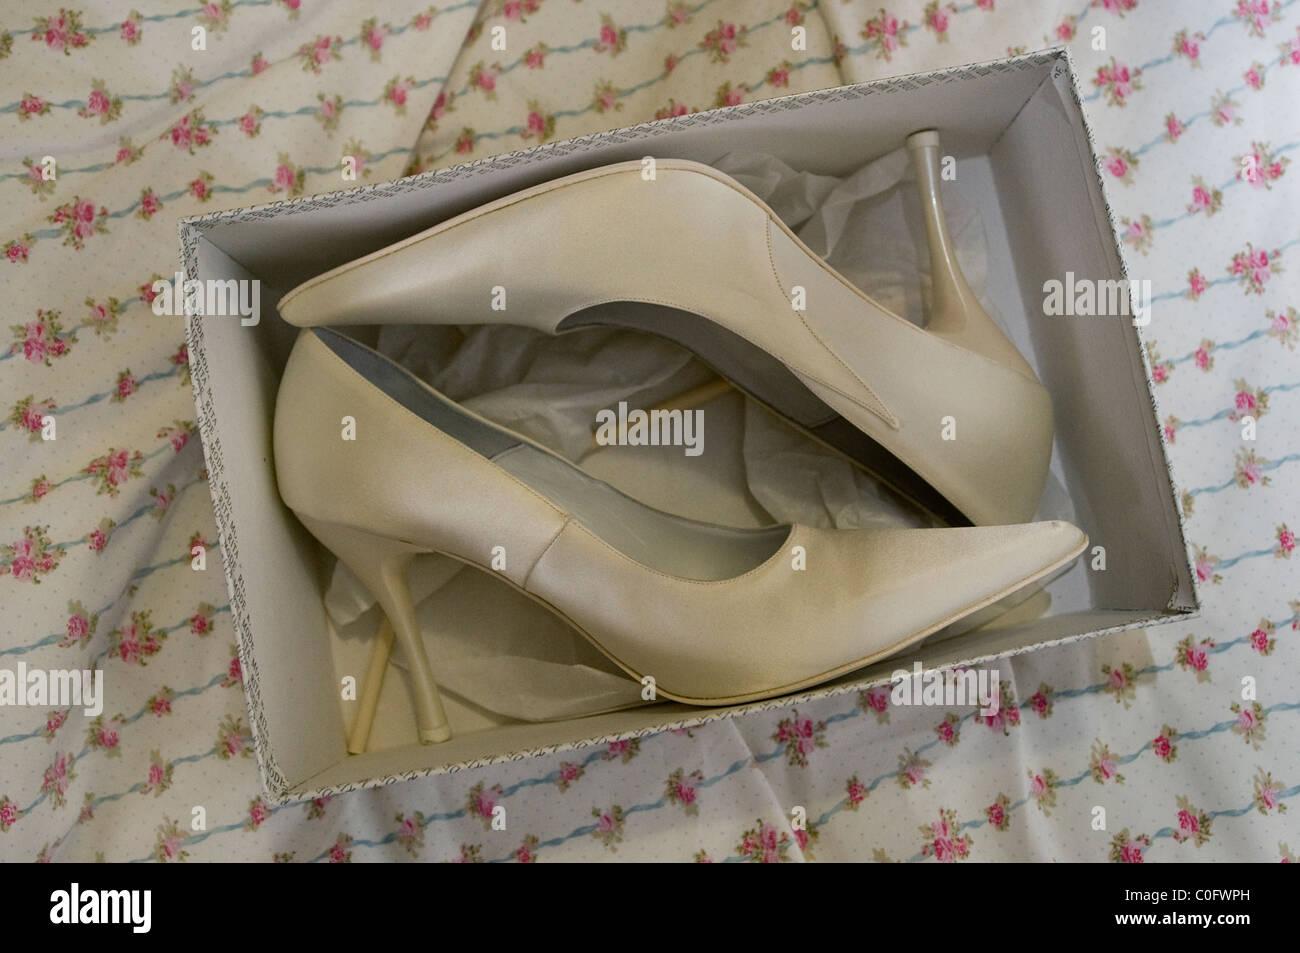 c880f98282b Wedding Heels Stock Photos & Wedding Heels Stock Images - Alamy